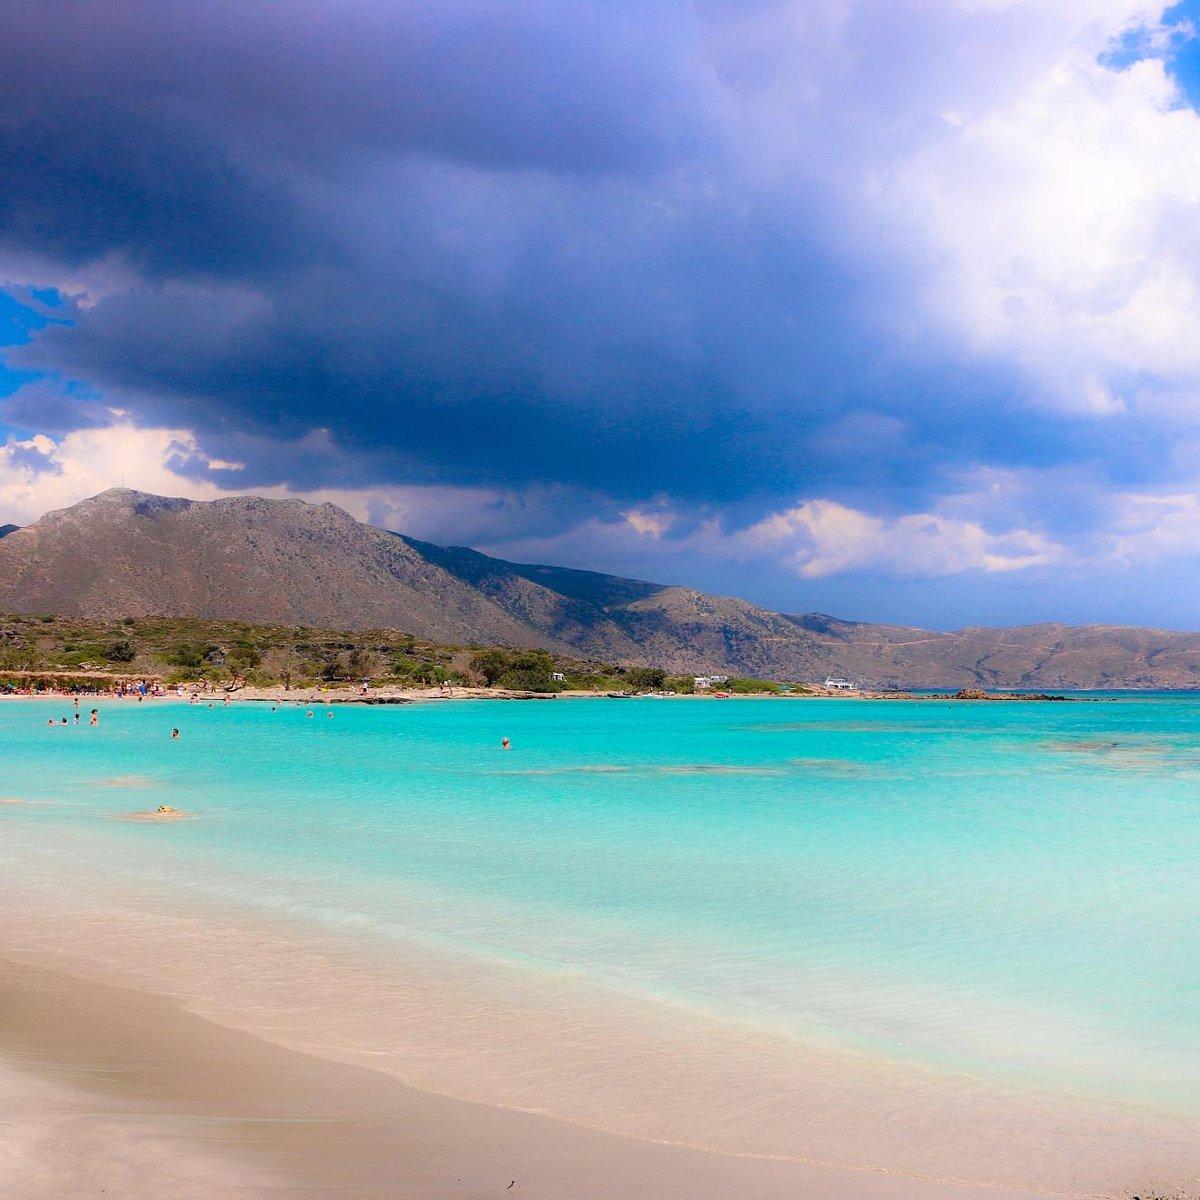 Elafonissi Beach - Aktuelle 2021 - Lohnt es sich? (Mit fotos) - Tripadvisor